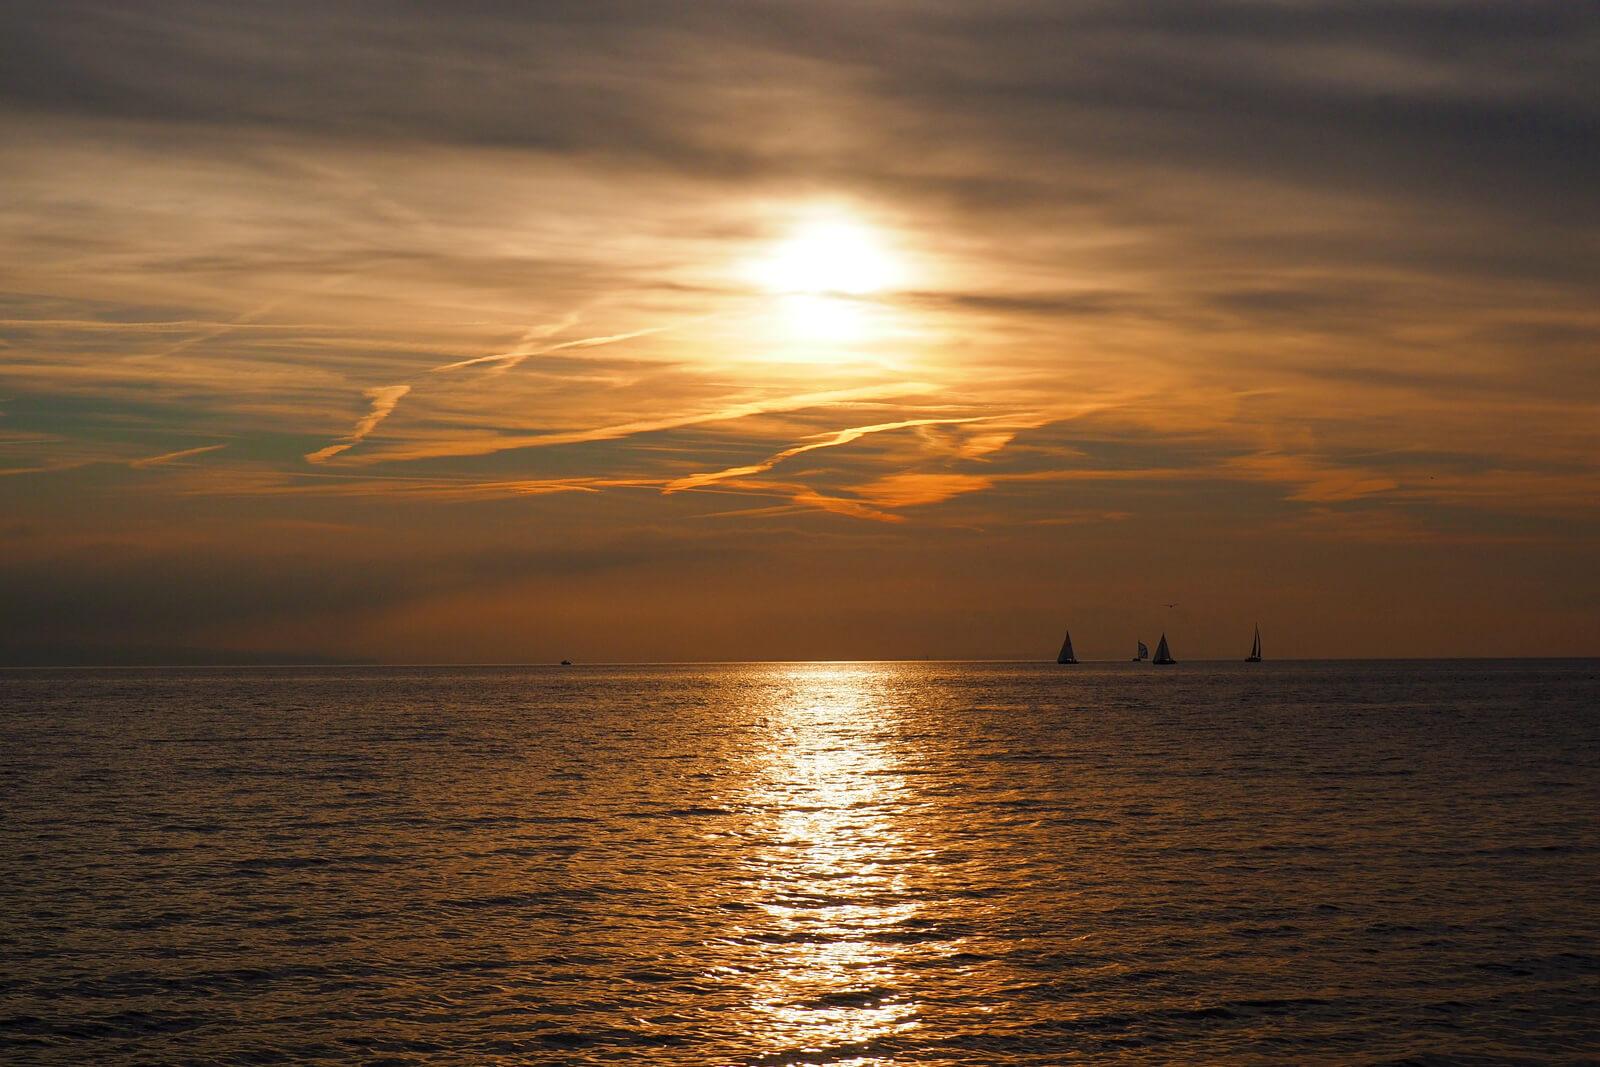 Lake Geneva Sunset from Ouchy, Switzerland